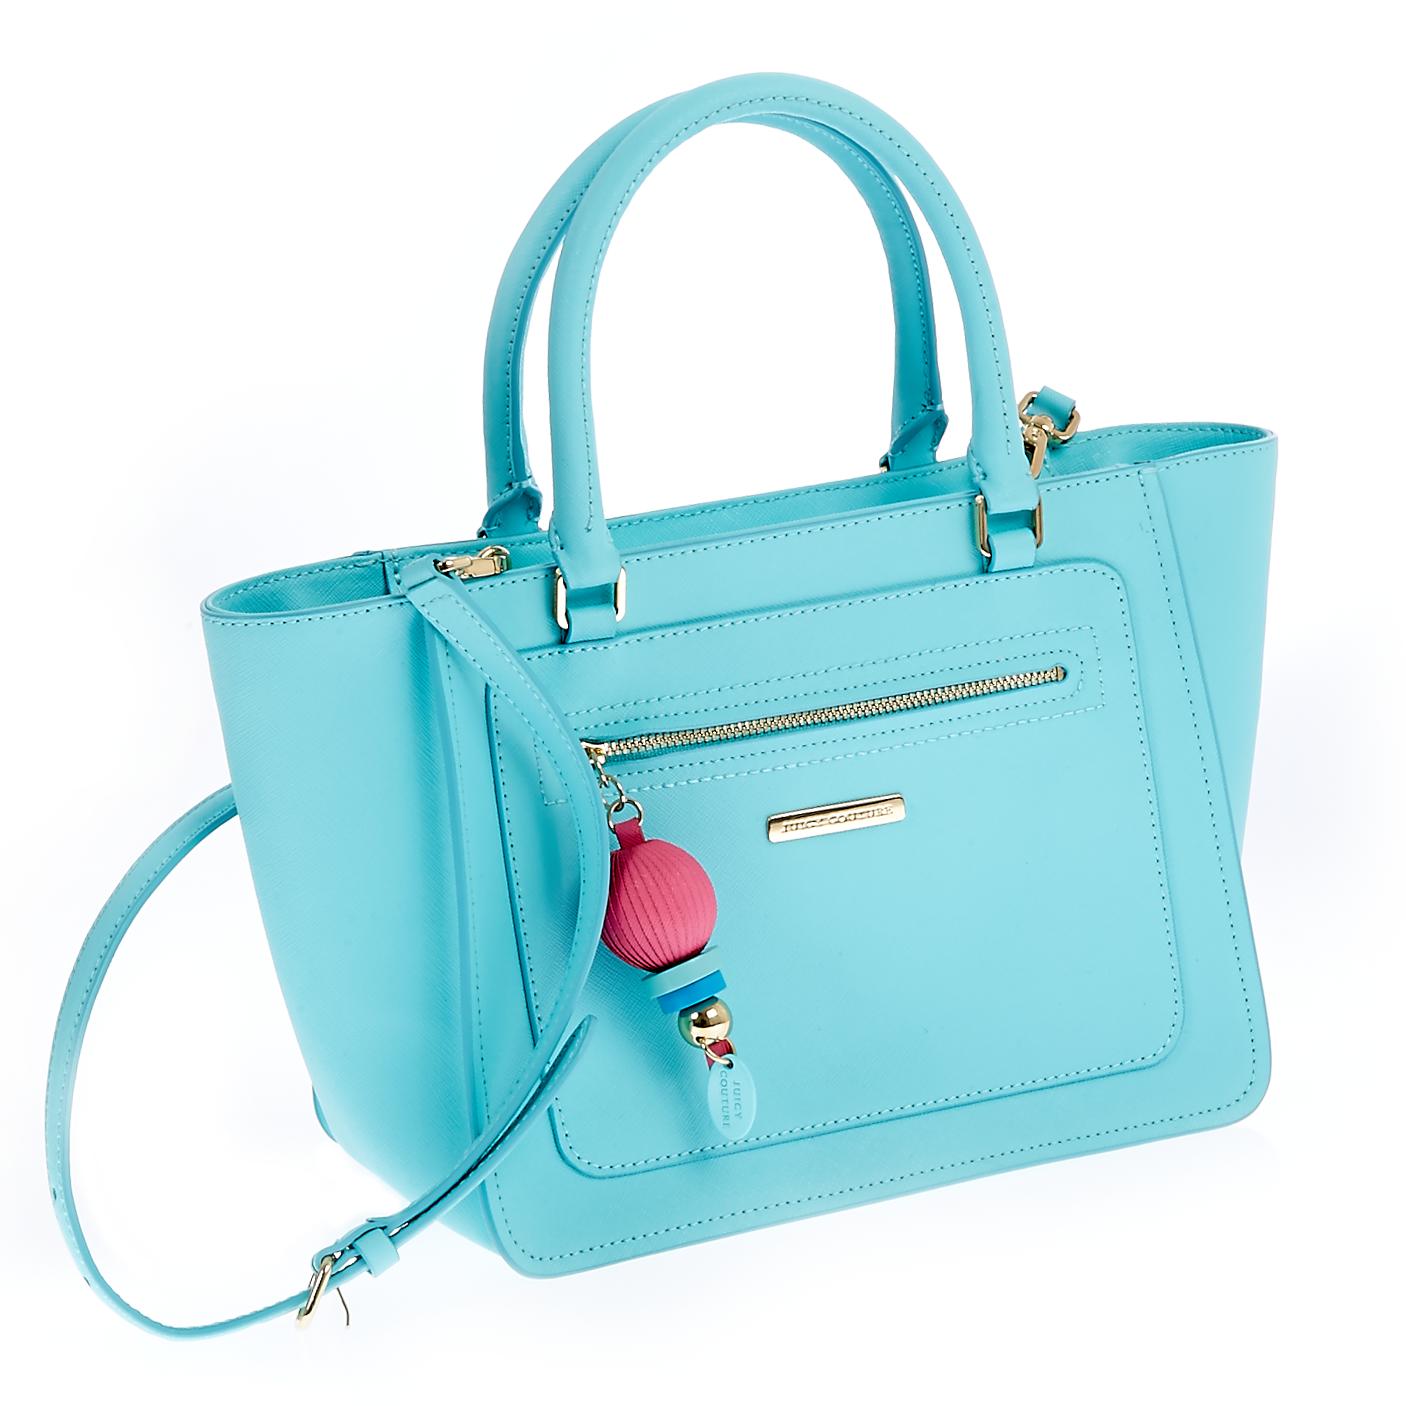 JUICY COUTURE - Γυναικεία τσάντα Juicy Couture μπλε γυναικεία αξεσουάρ τσάντες σακίδια χειρός